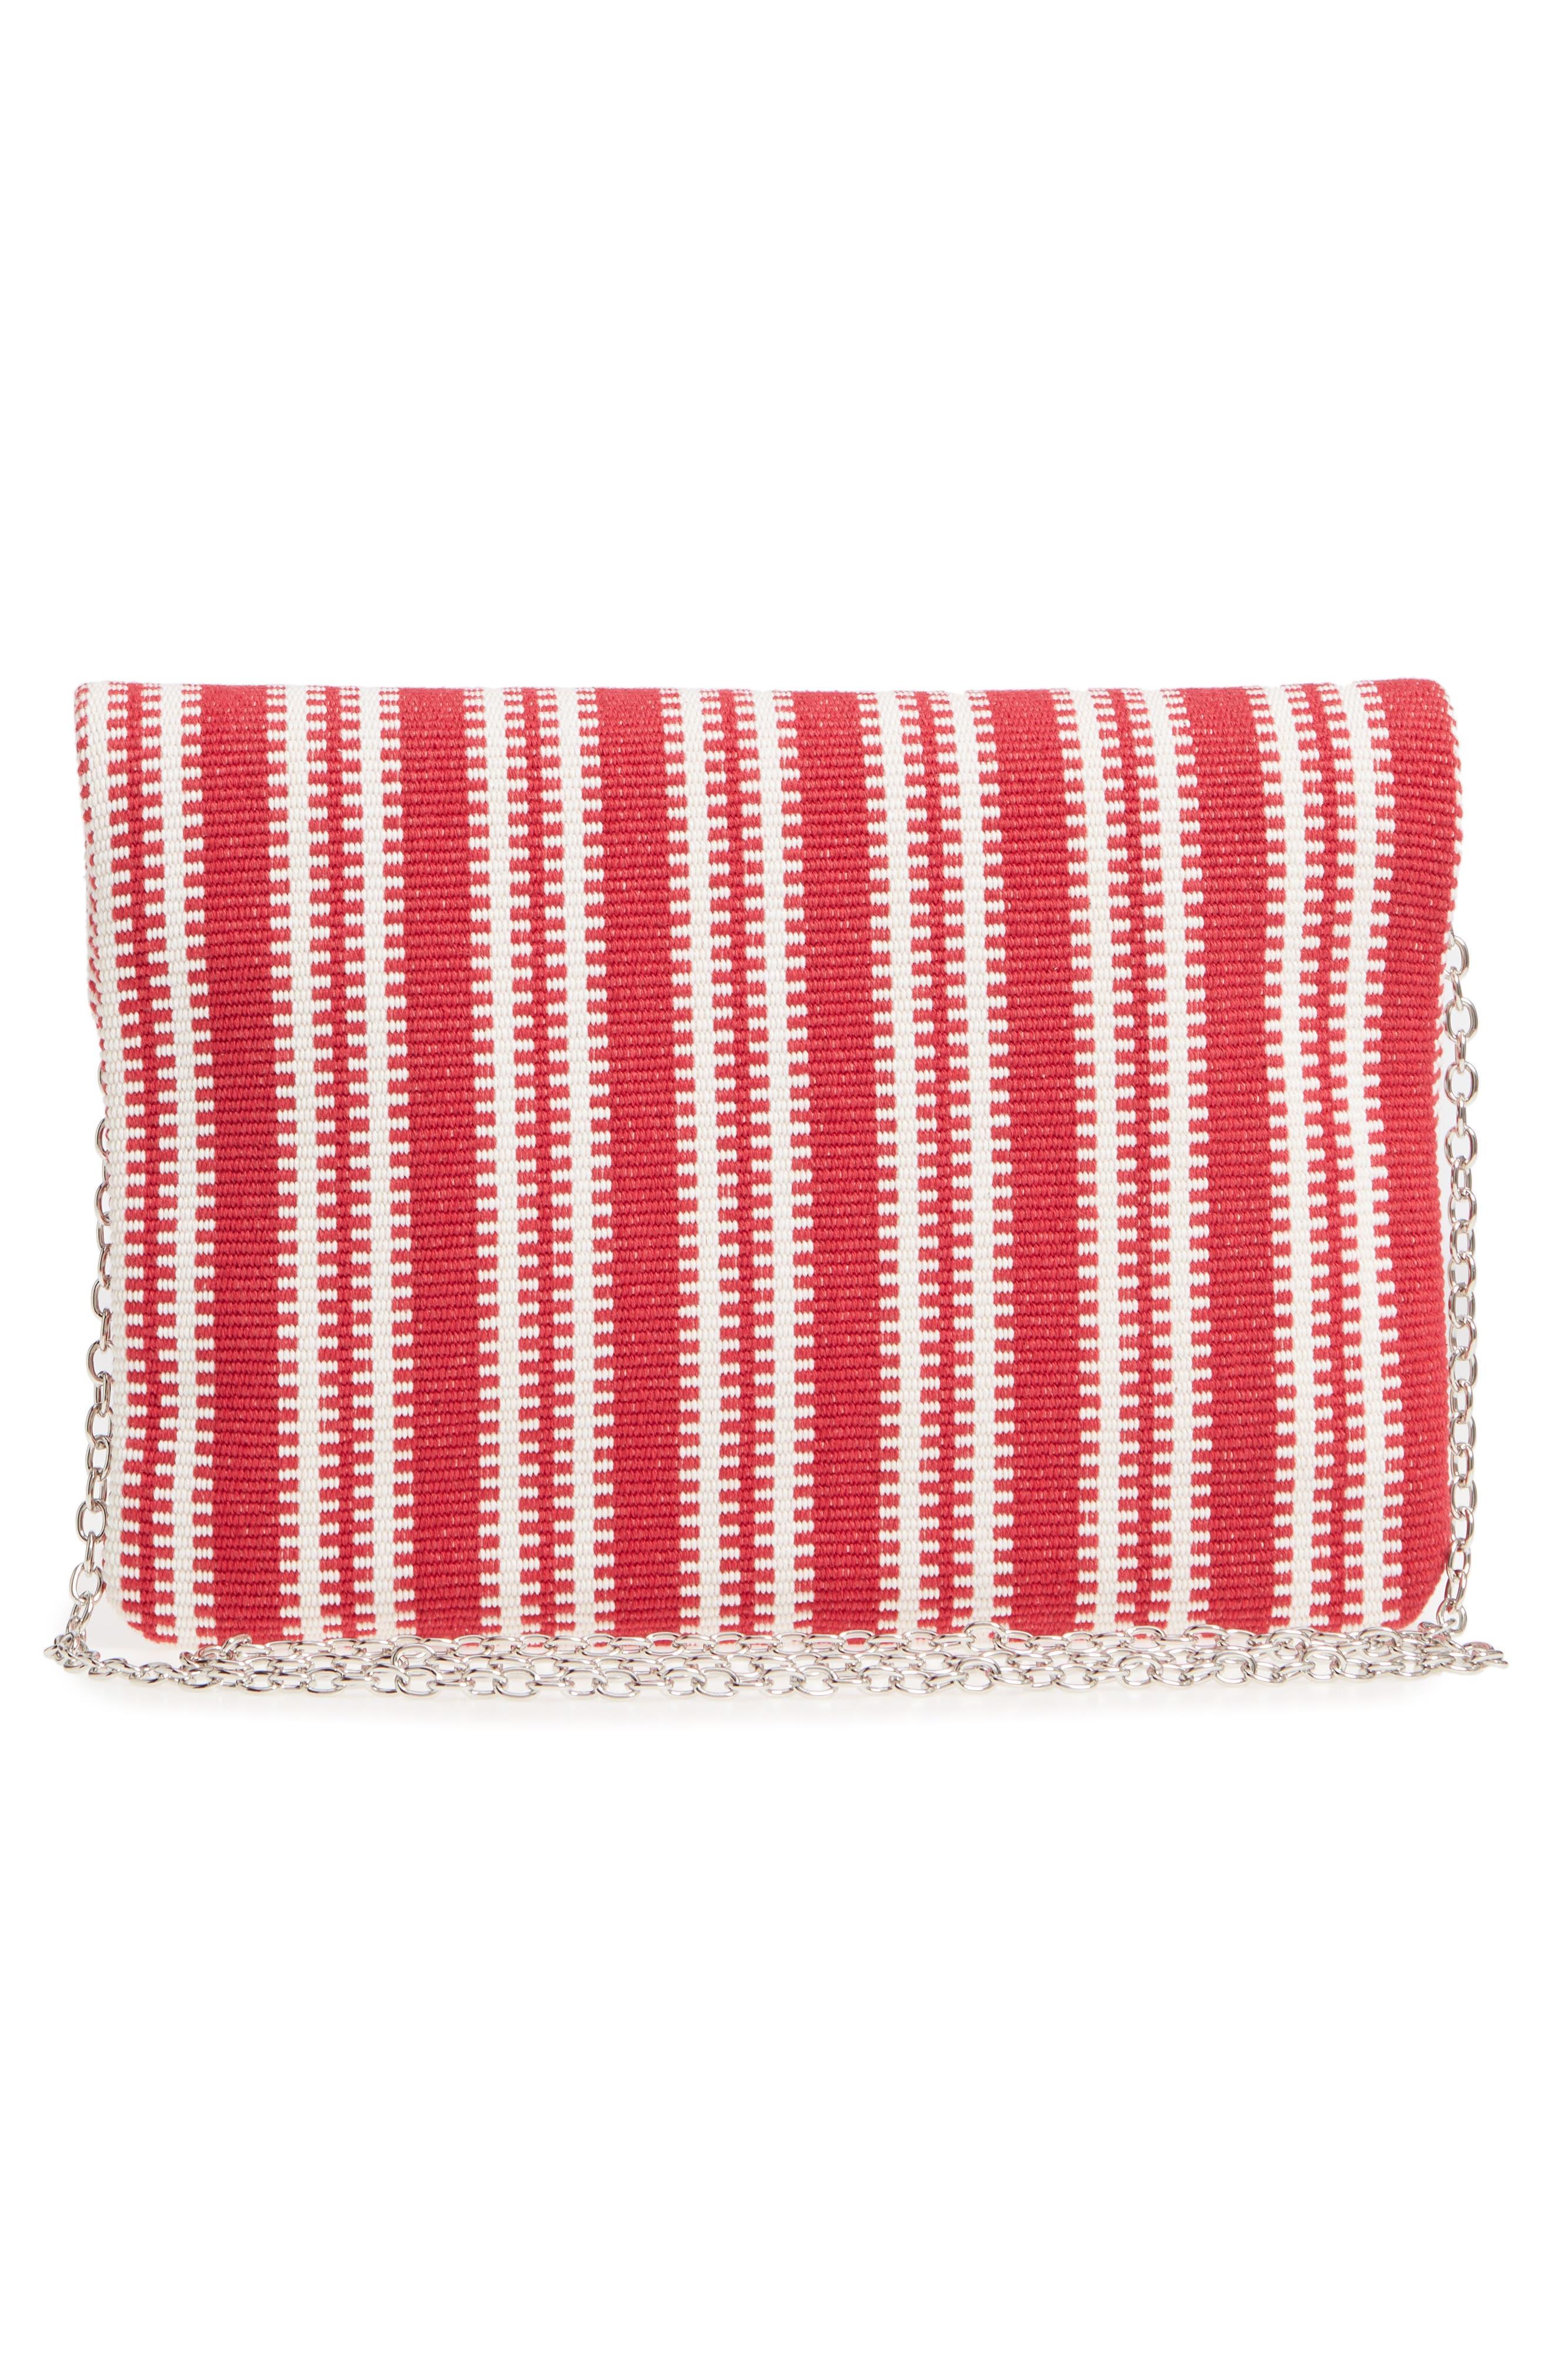 Stripe Woven Clutch,                             Alternate thumbnail 3, color,                             Red Multi